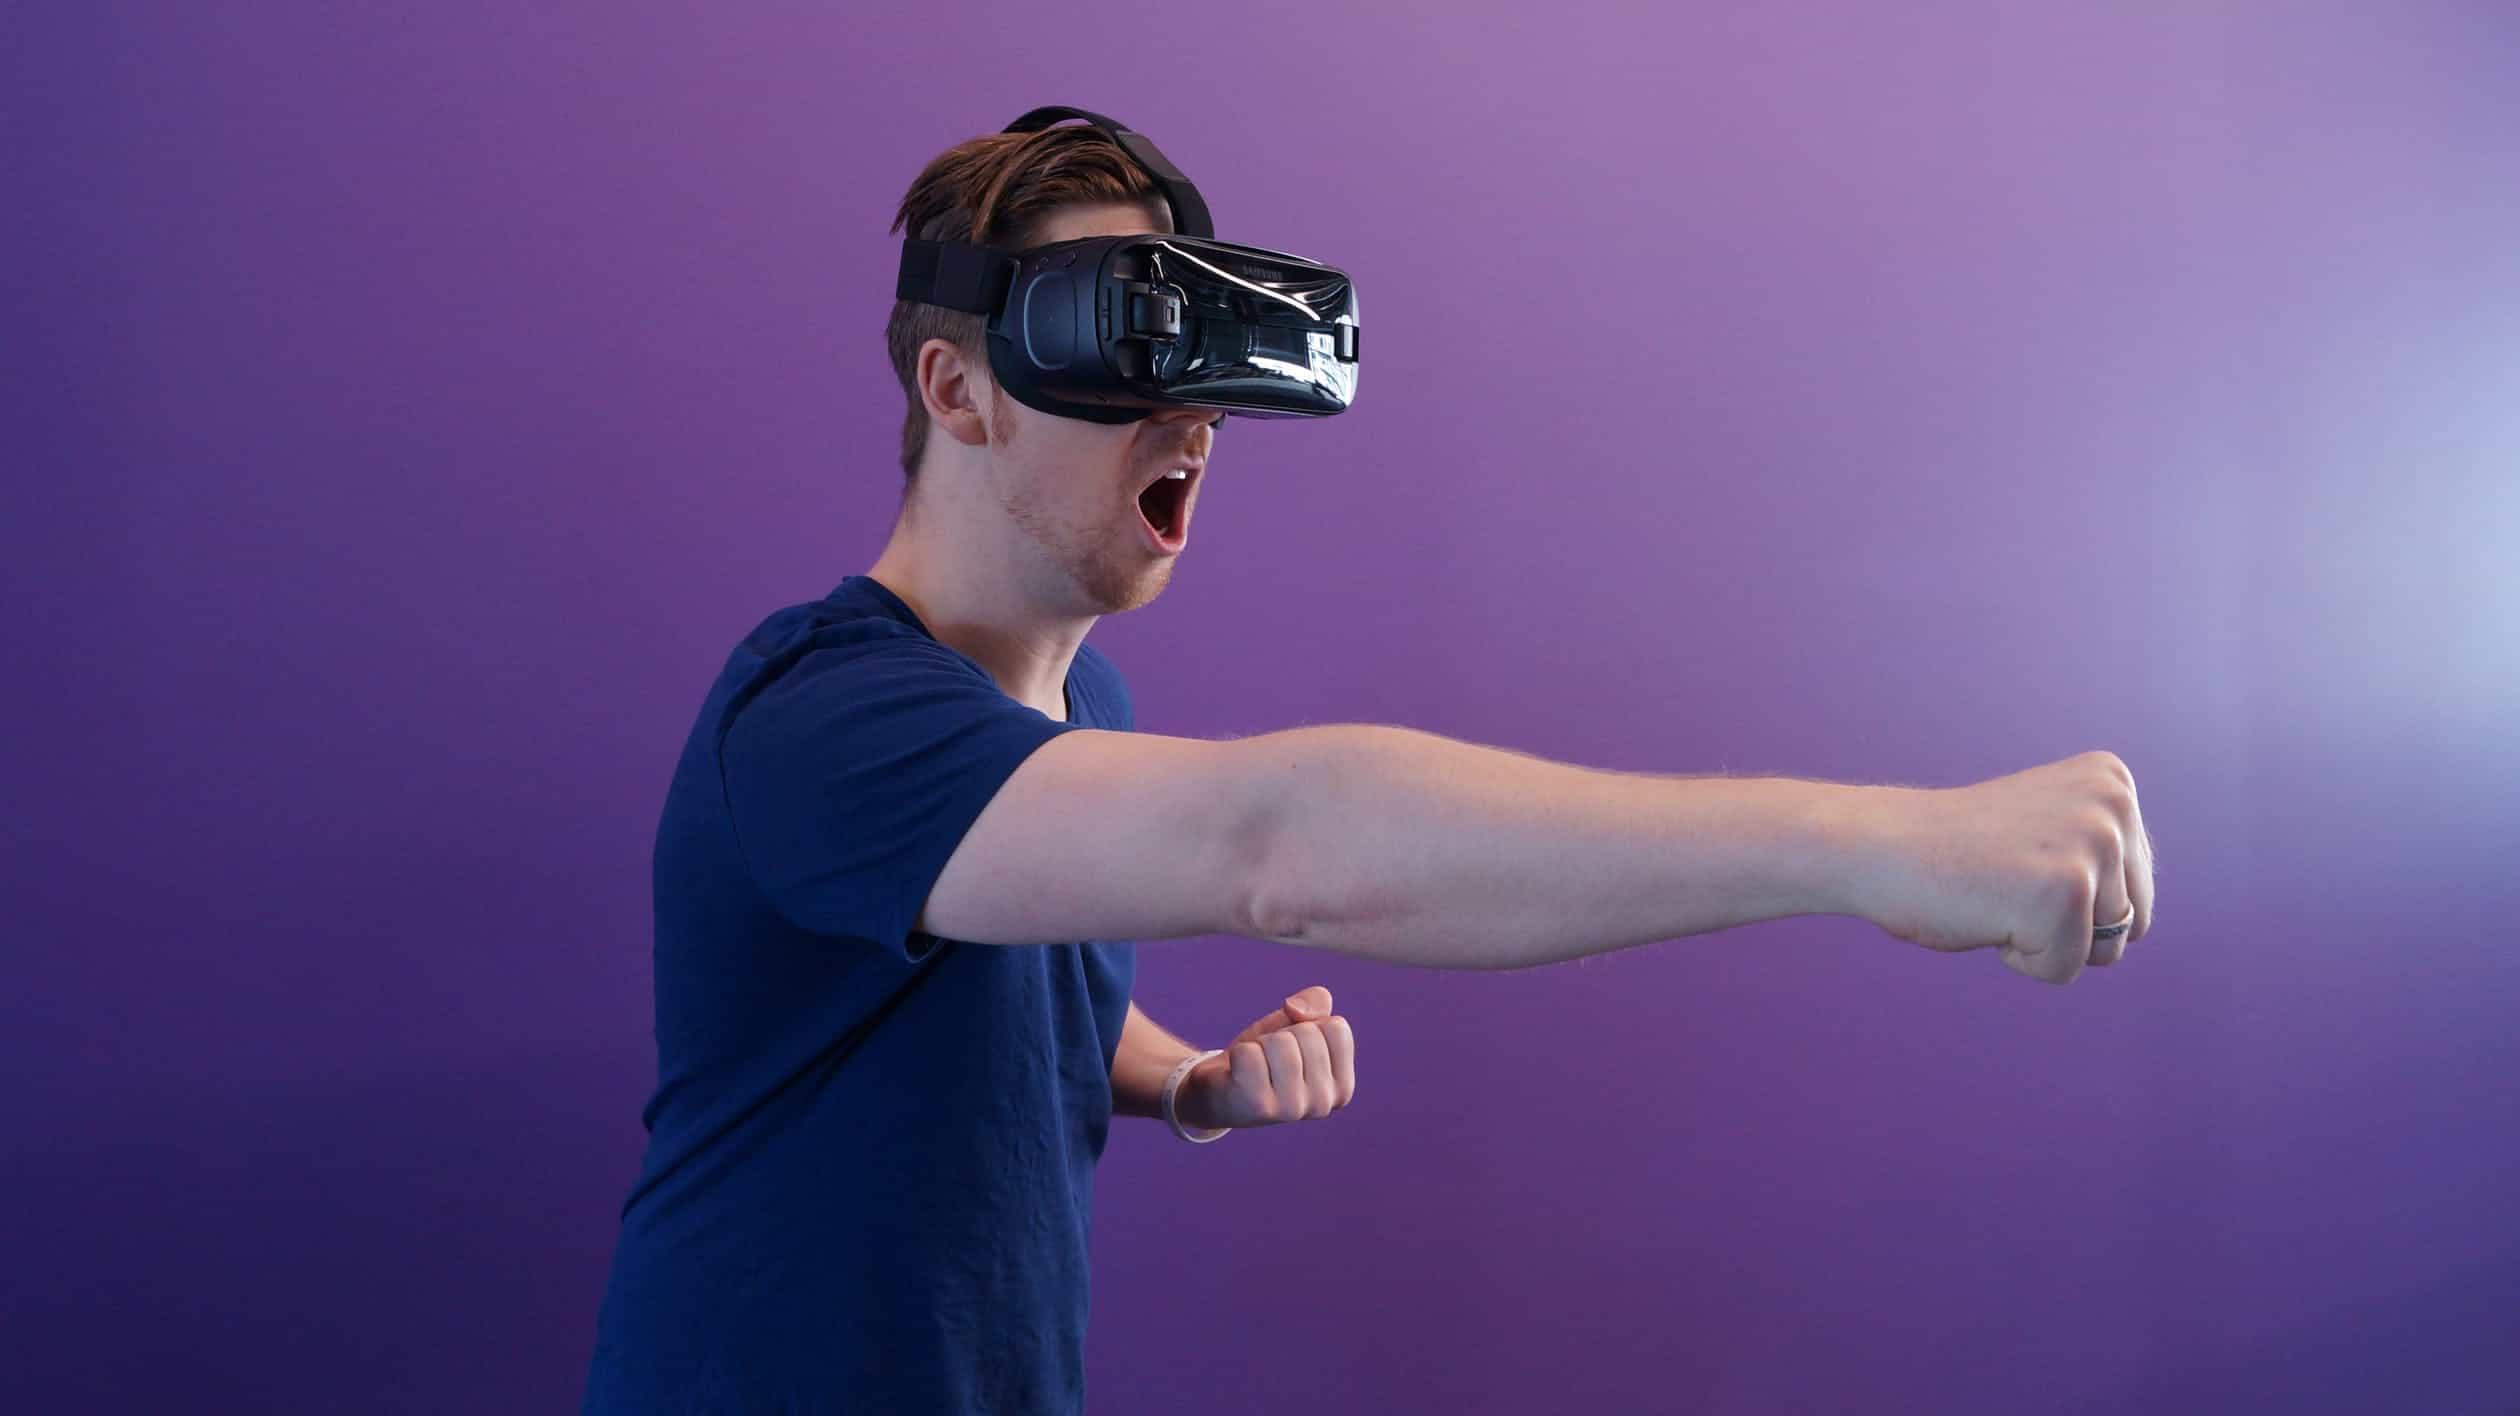 Sanal Gerçeklik / Virtual Reality – VR